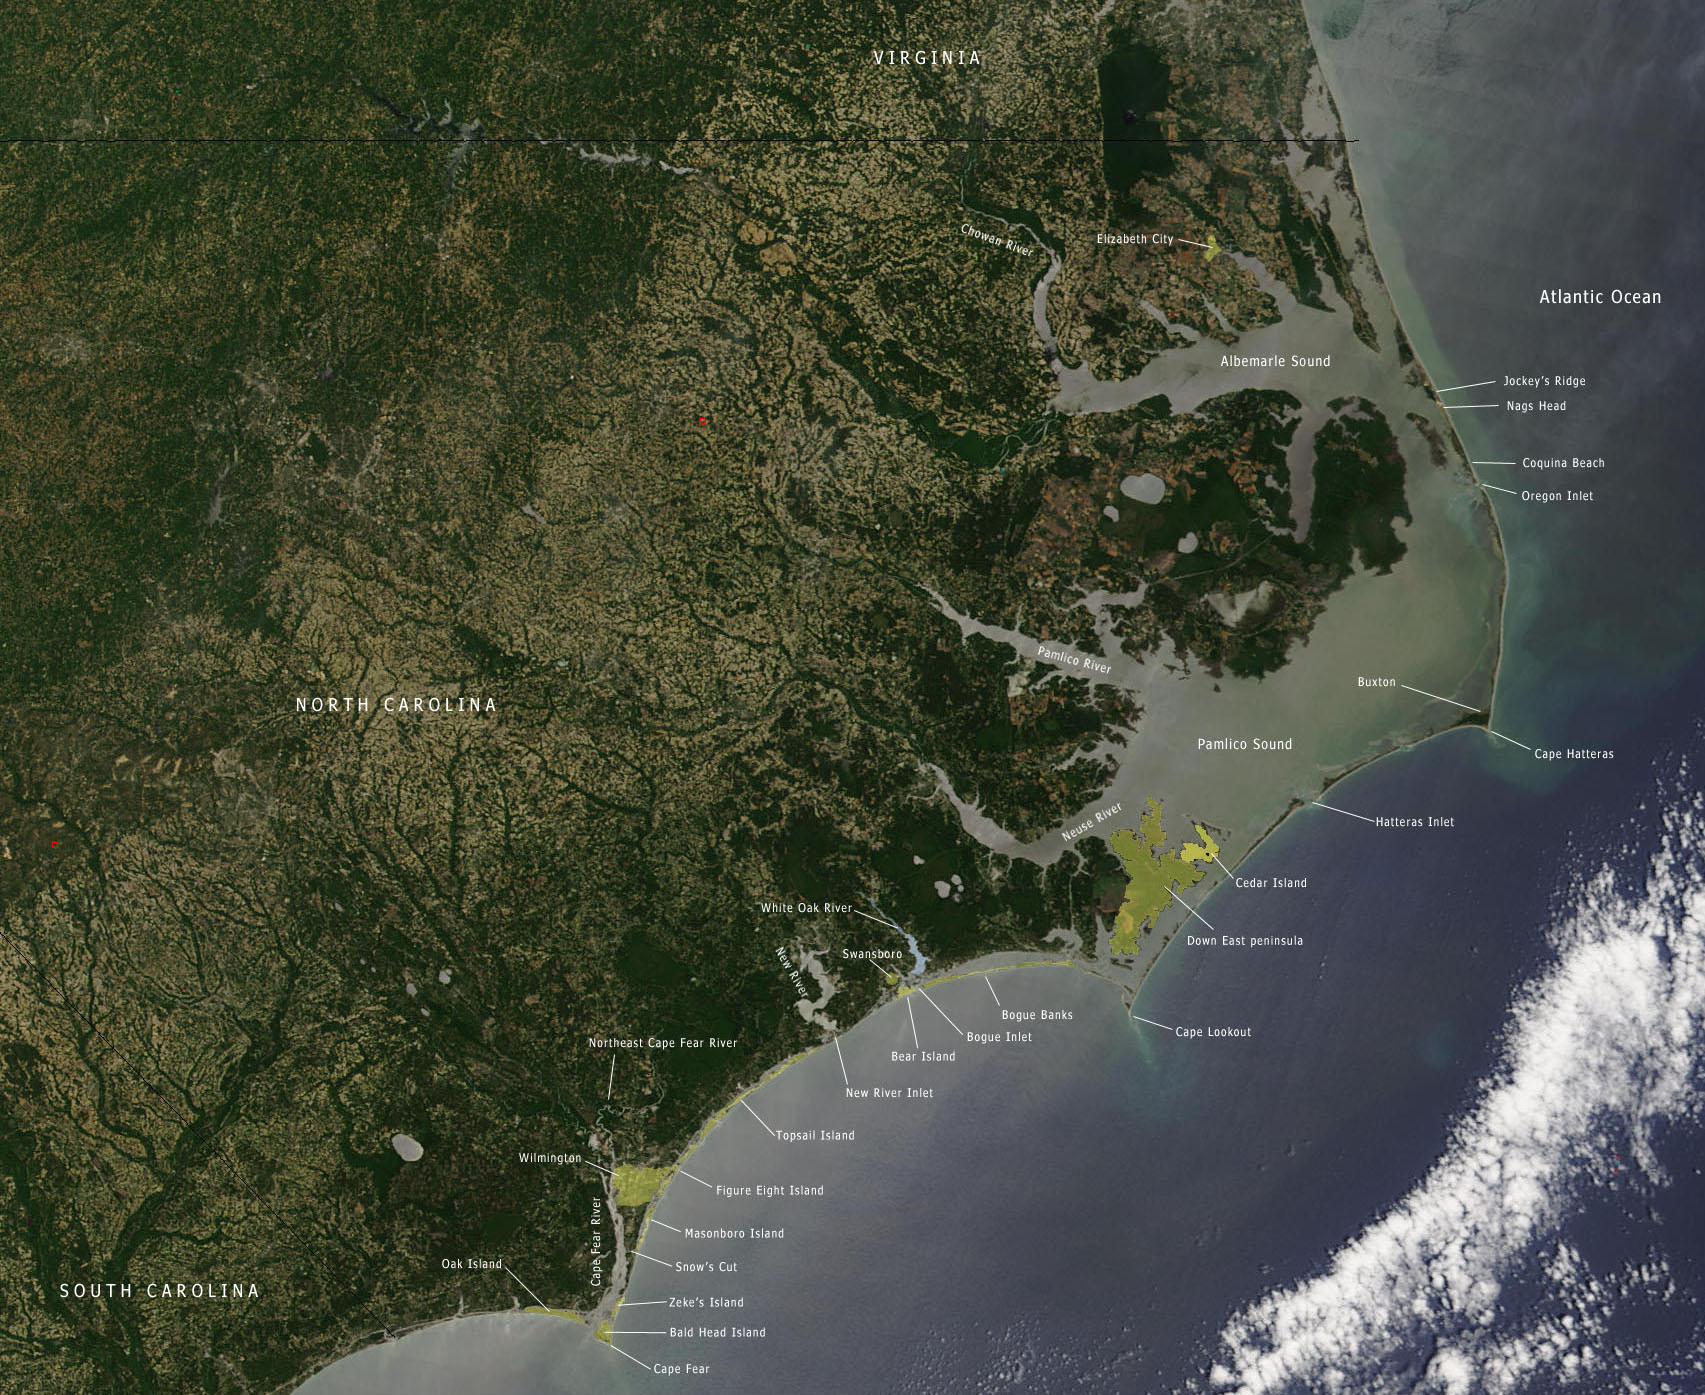 Outer Banks North Carolina Islands Size